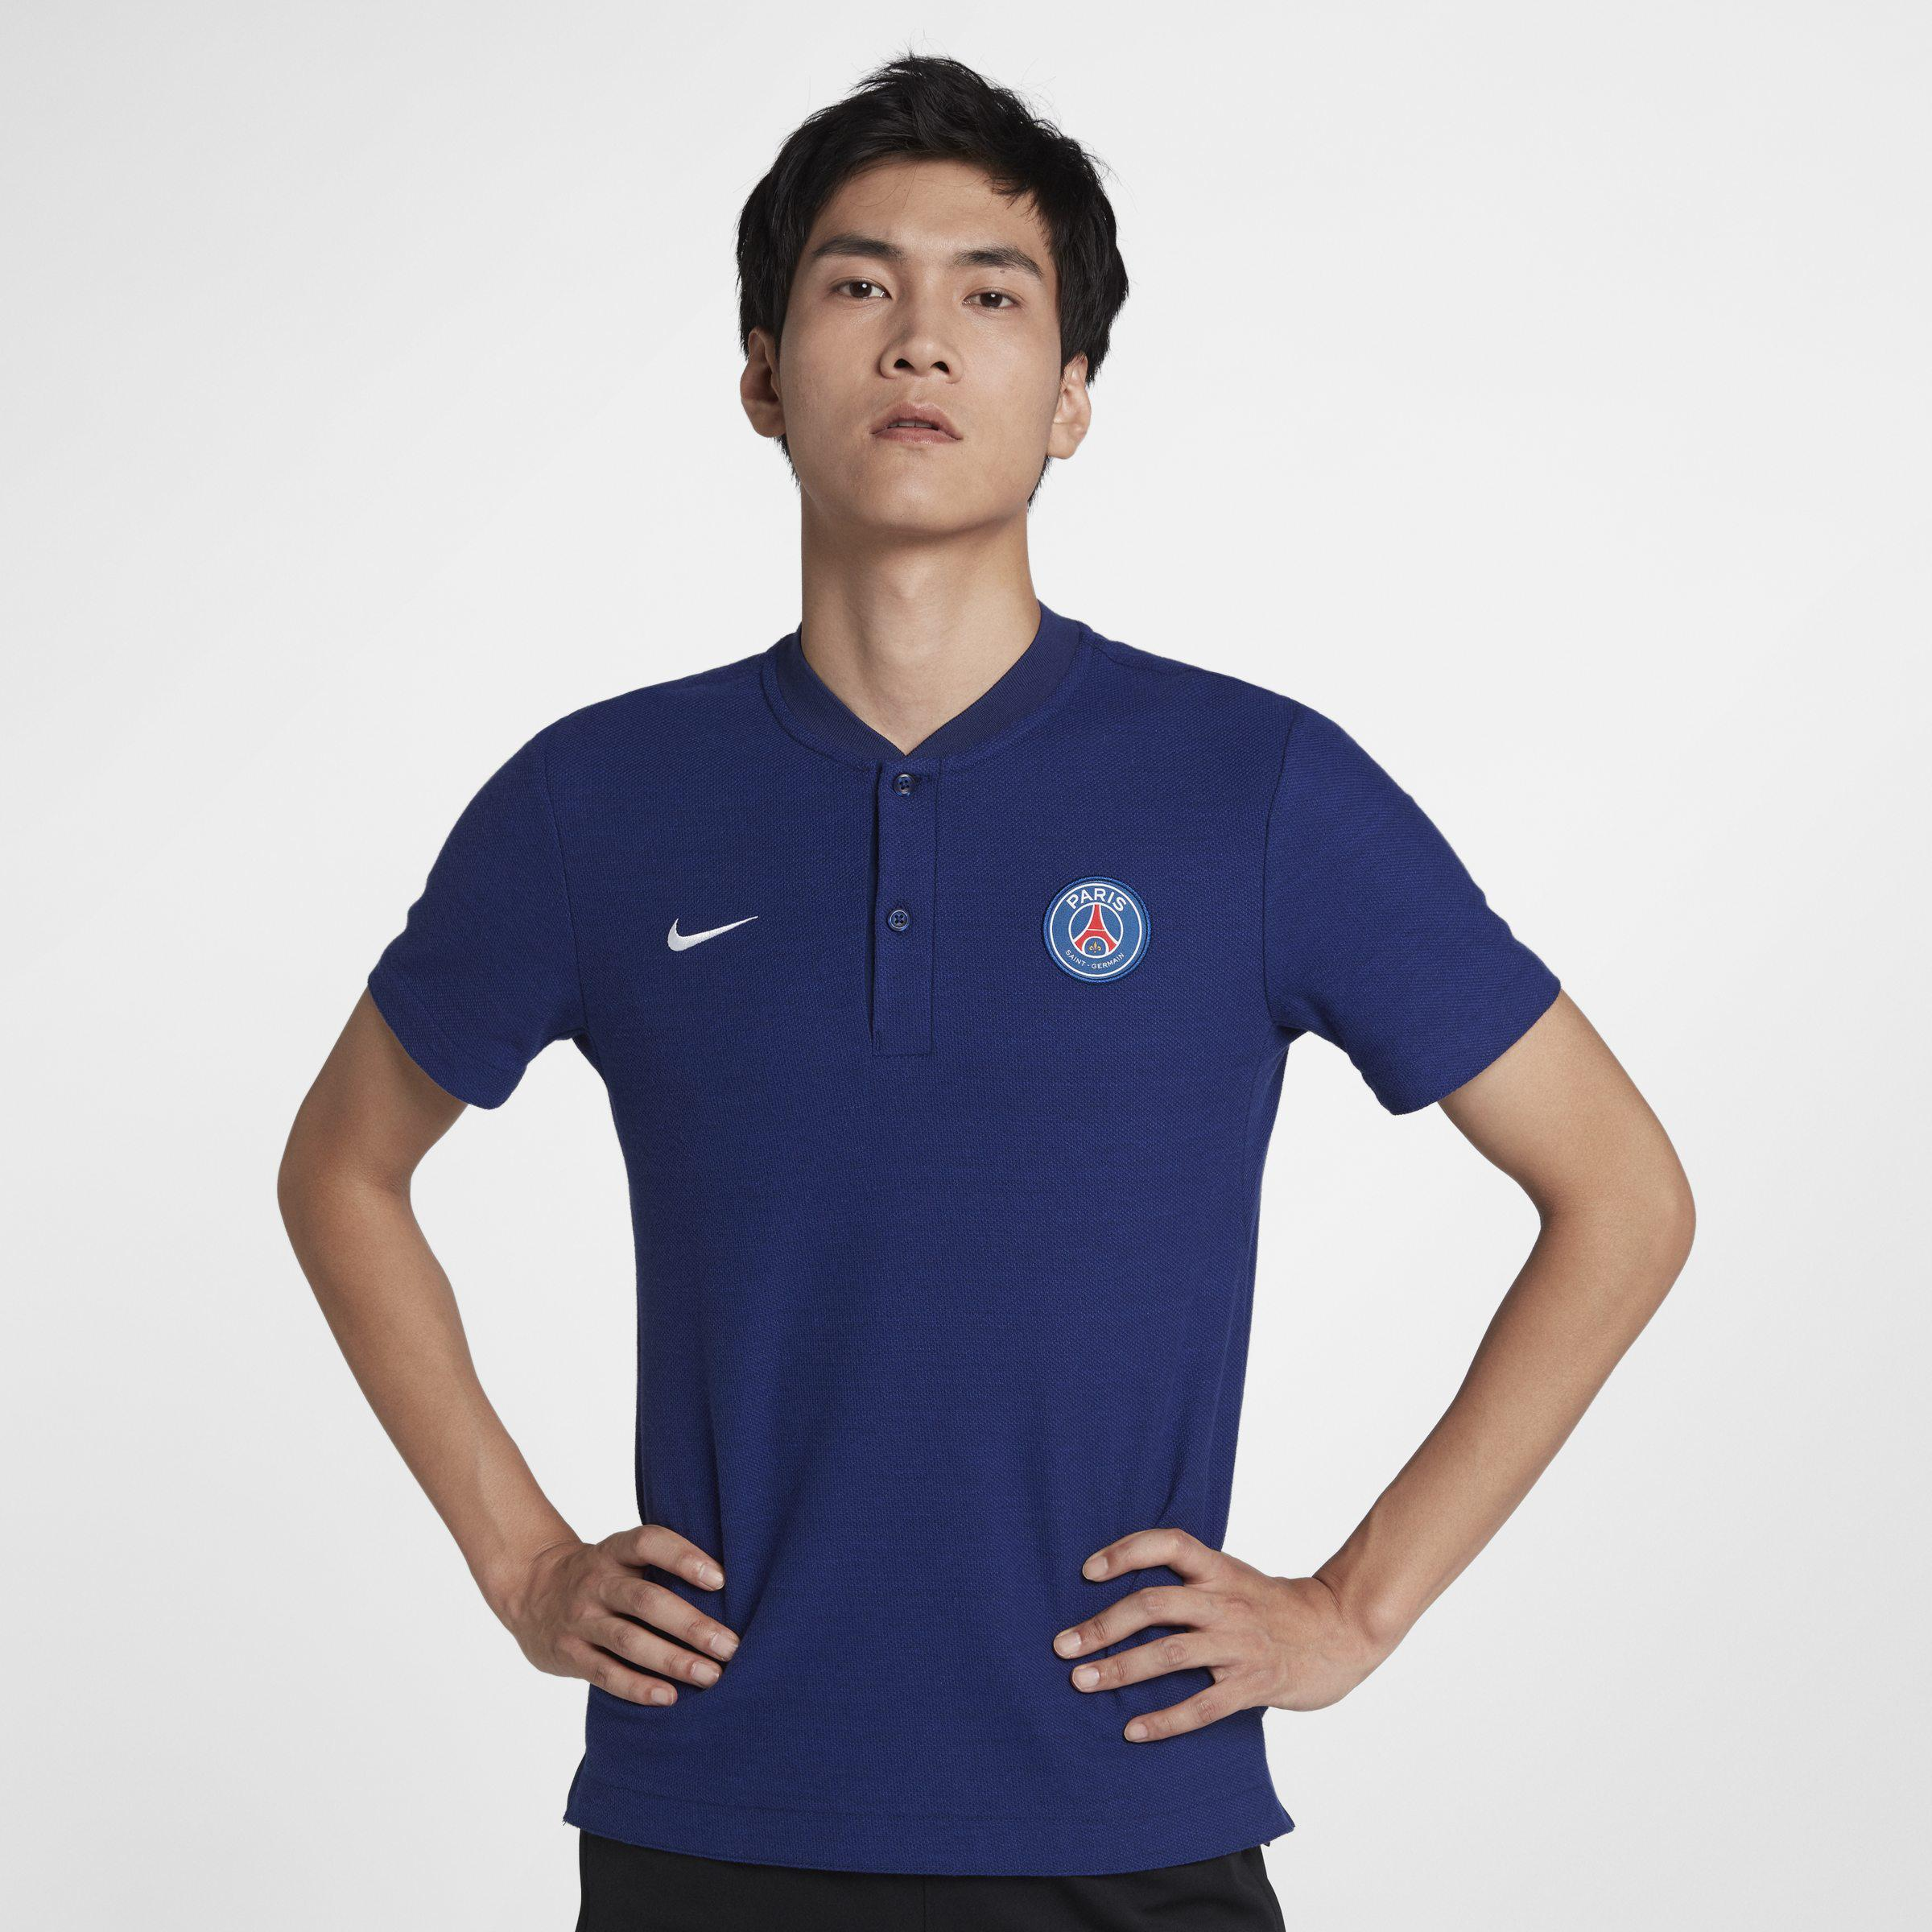 900d4b887dd9e Nike Paris Saint-germain Slam Men s Polo Shirt in Blue for Men ...